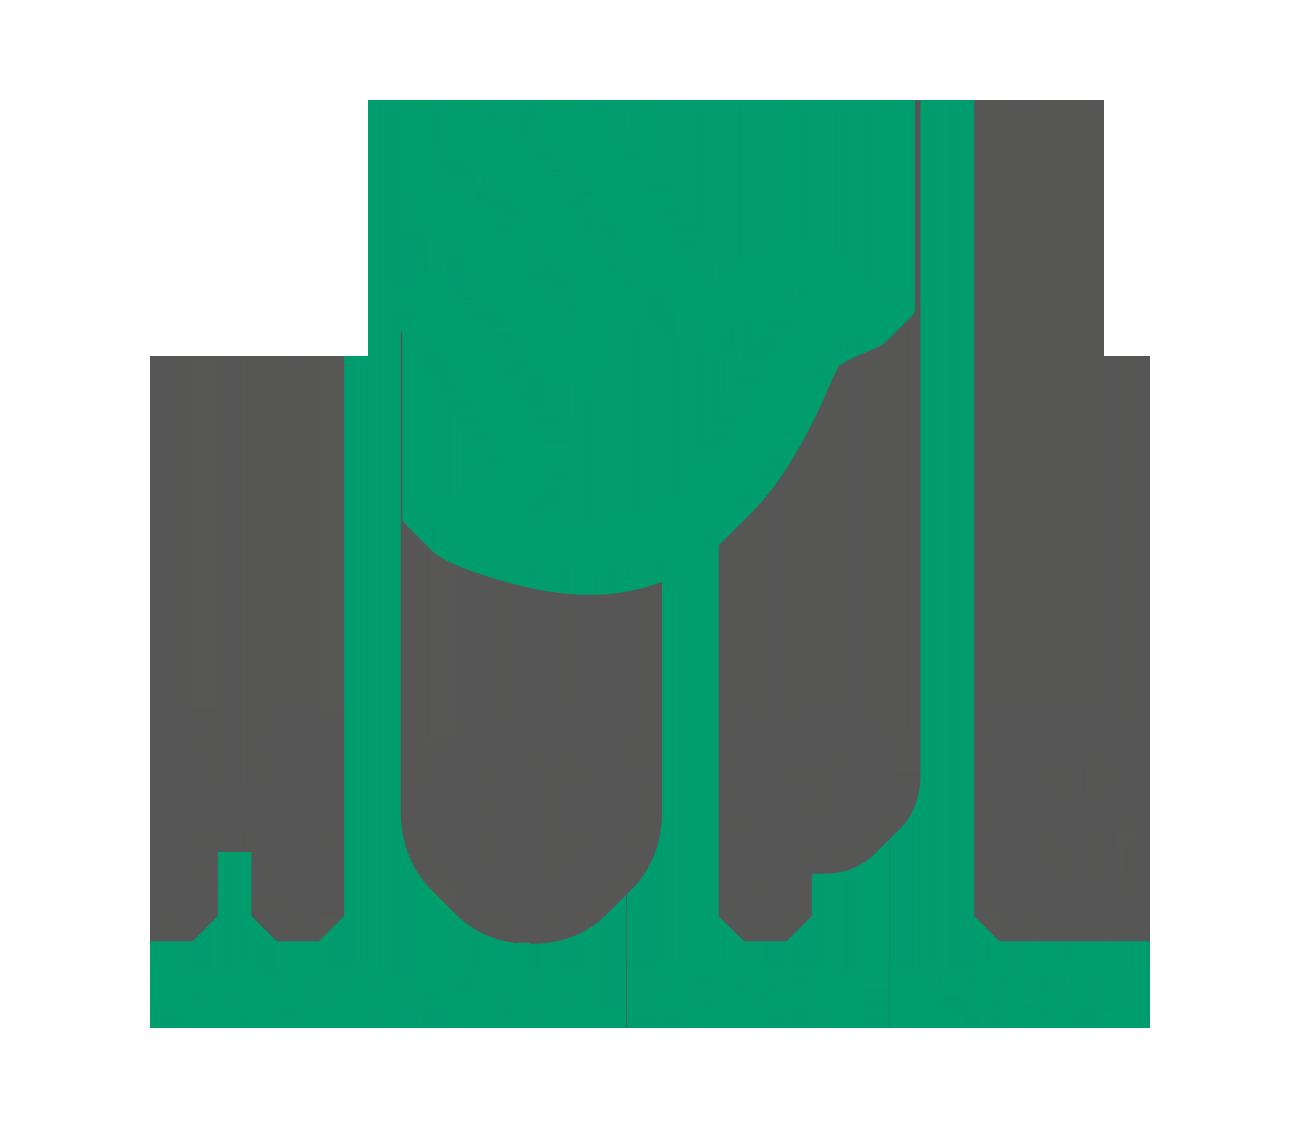 A mental health nonprofit organization needs a novel, timeless logo.